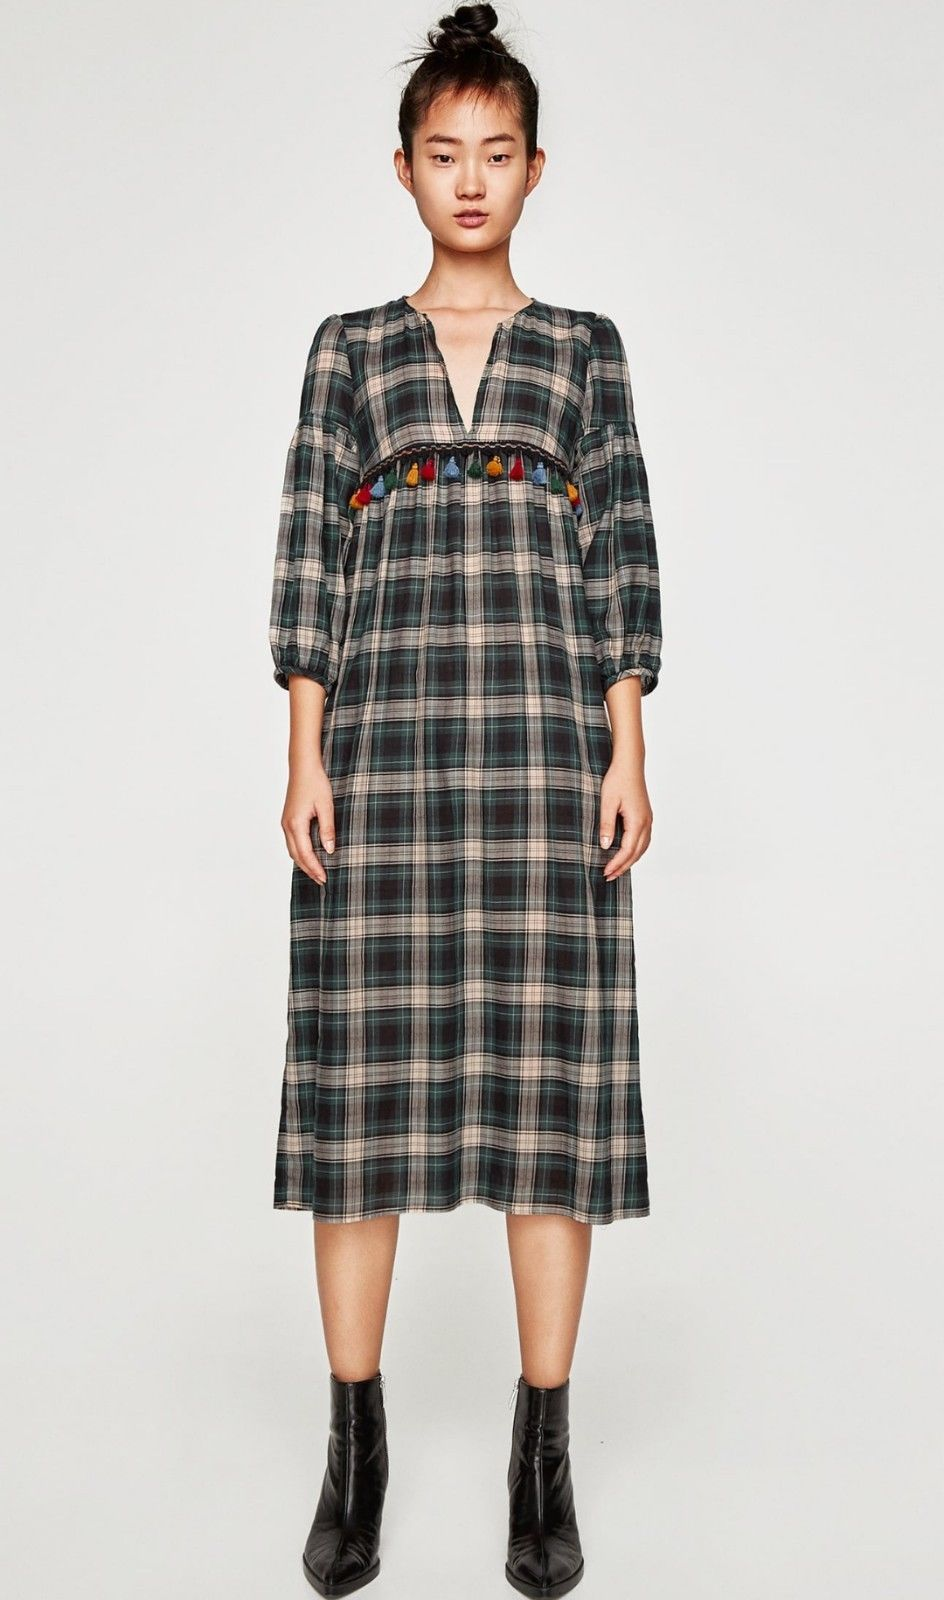 adcff935 Zara Woman Long Check Dress Size L in 2018 | Looks | Pinterest ...